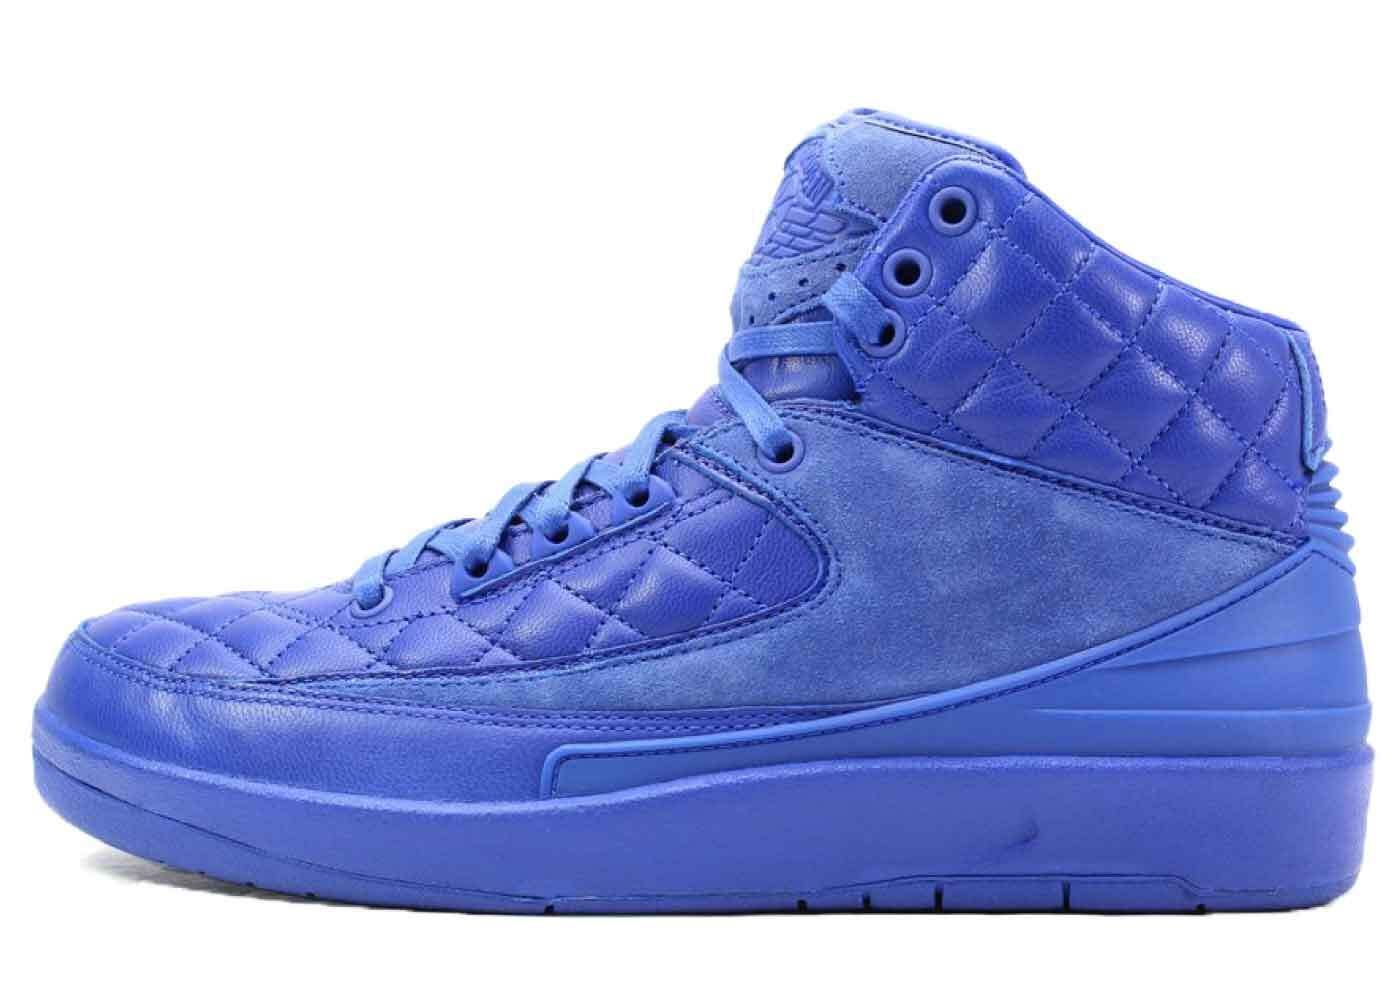 Nike Air Jordan 2 Retro Just Don Blue